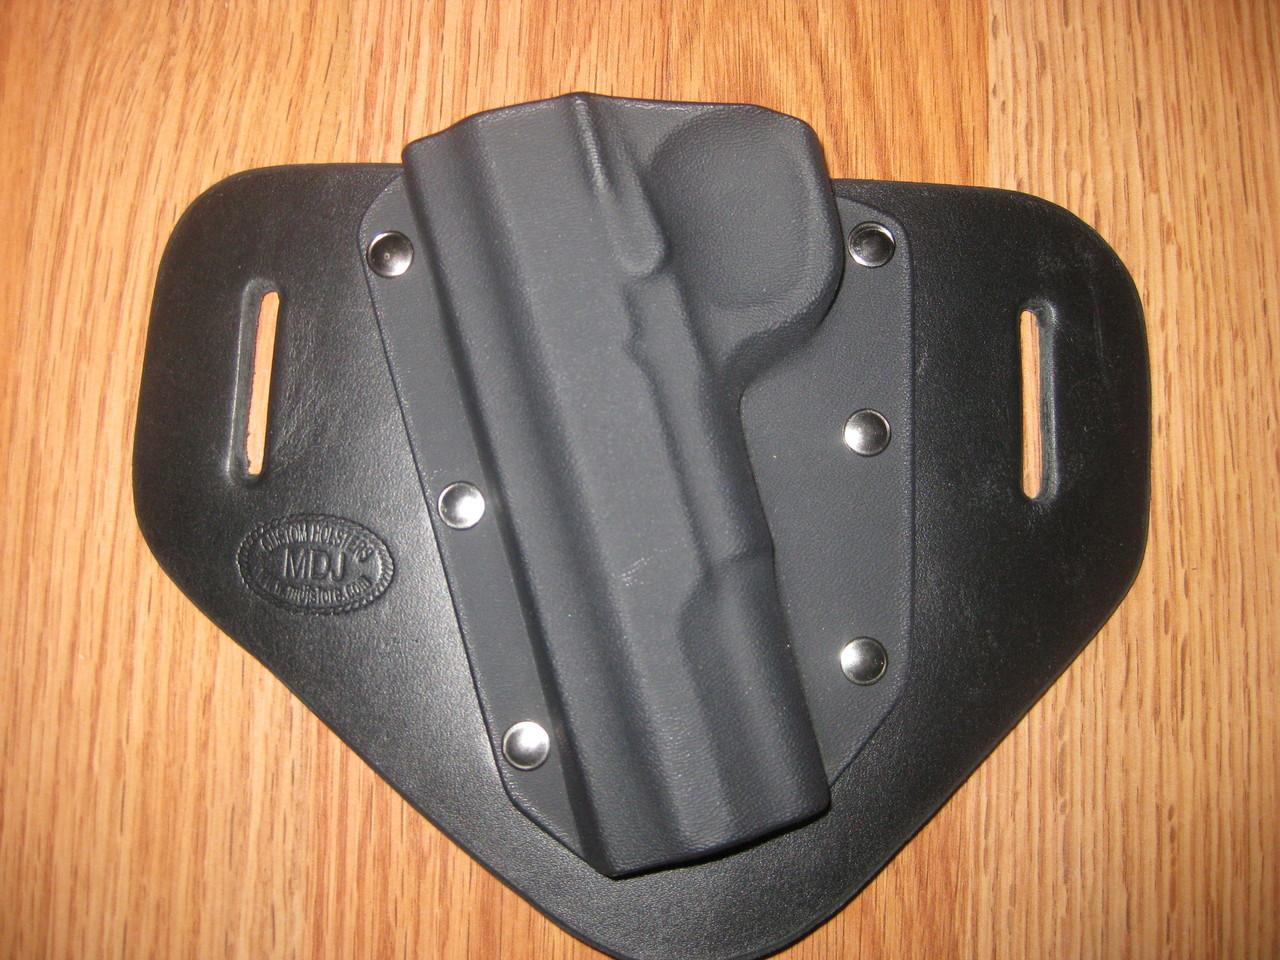 KIMBER OWB standard hybrid leather\Kydex Holster (fixed retention)